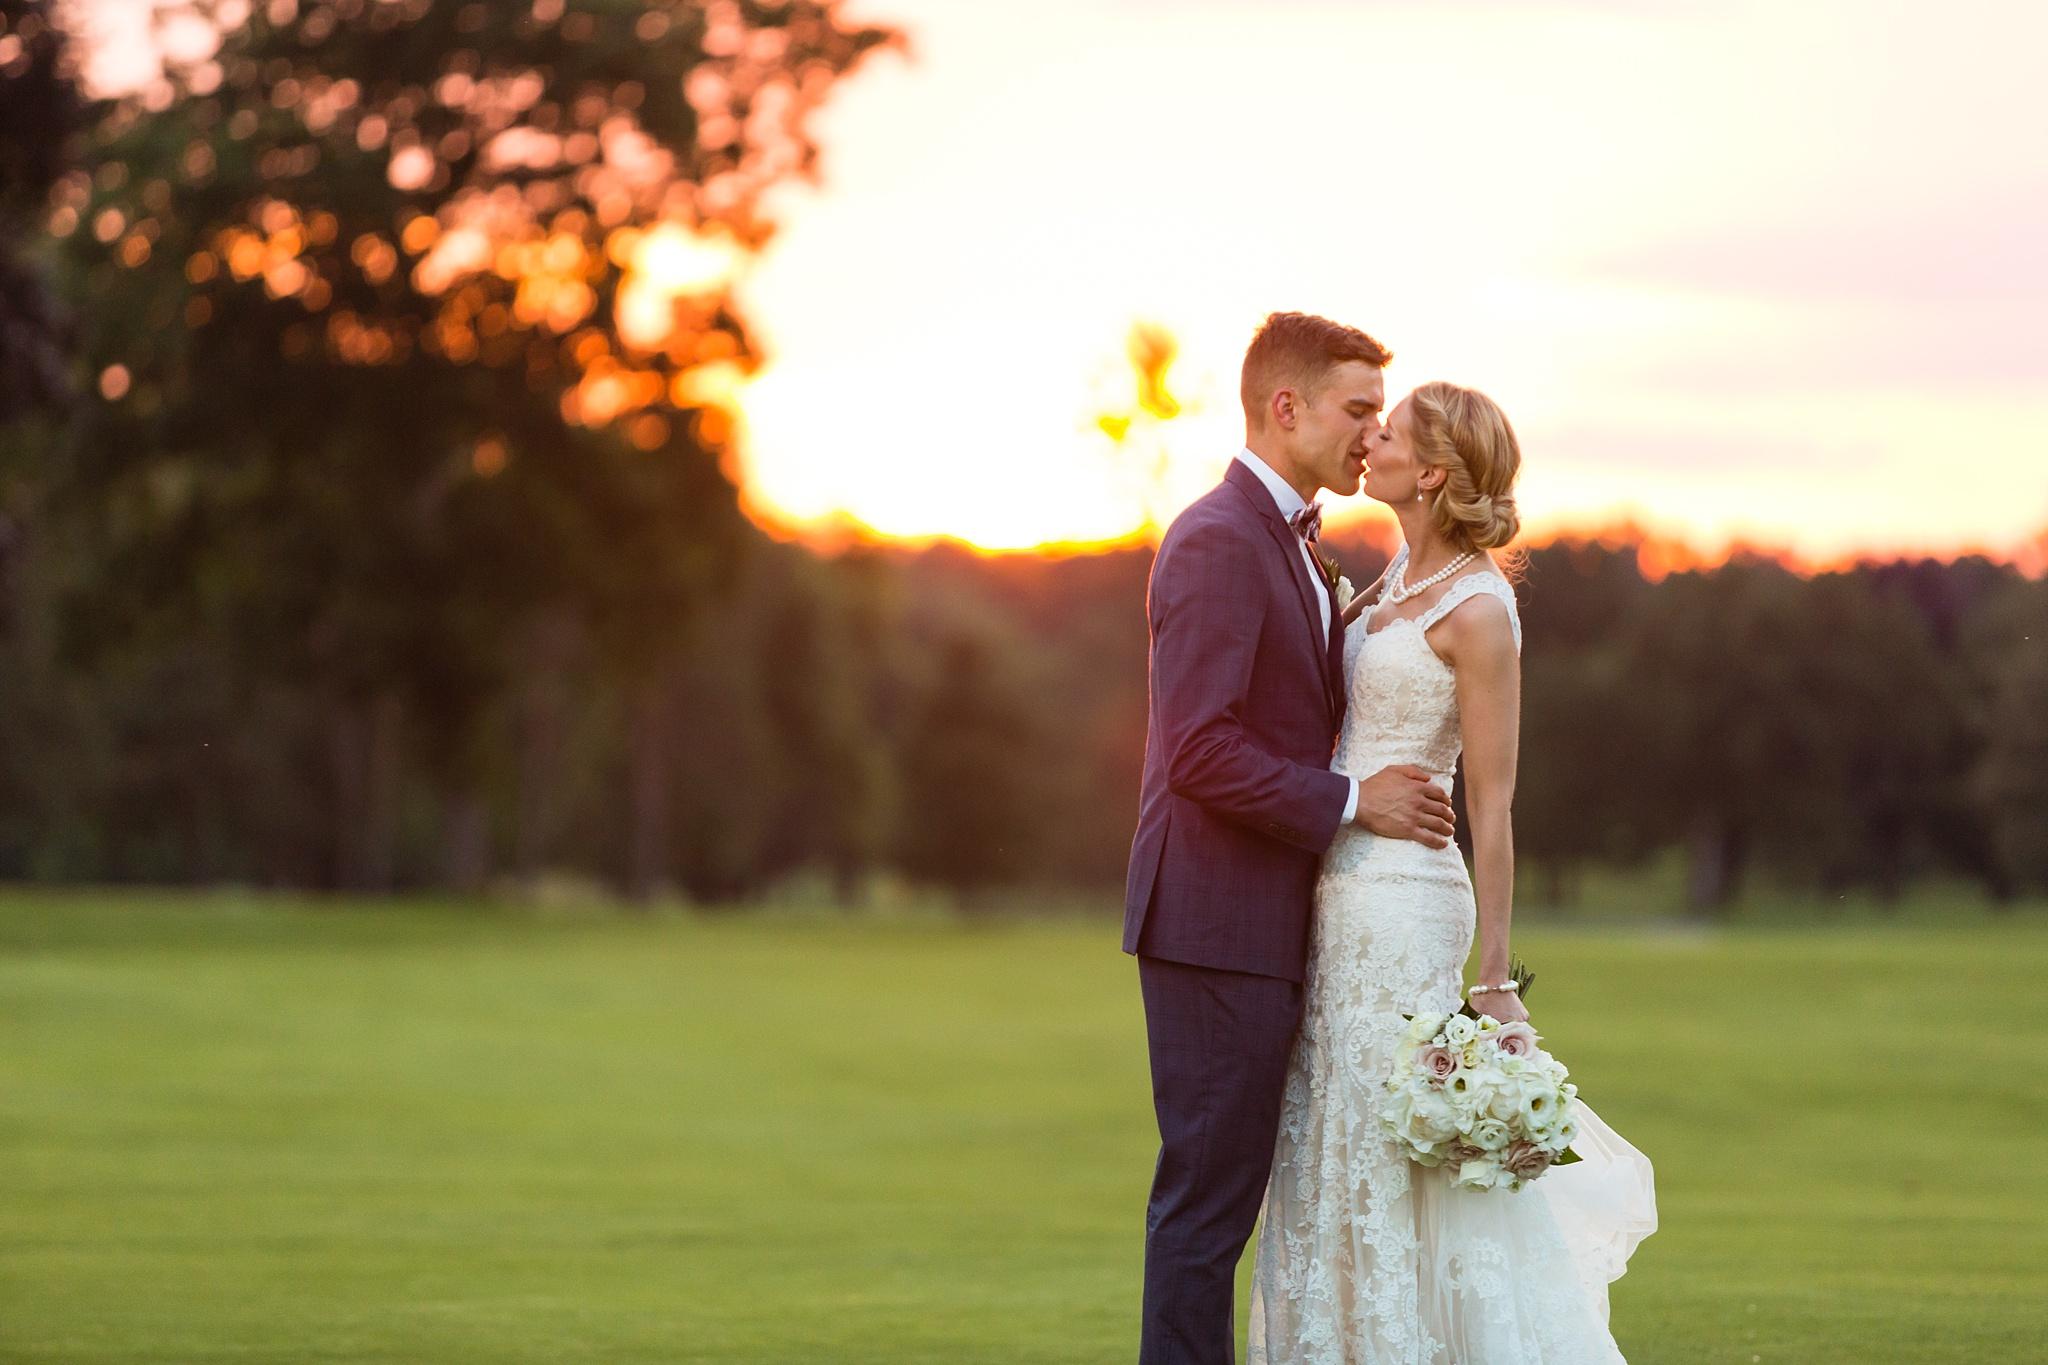 Becky_Cameron_Grand_Rapids_Blythefield Country_Club_Wedding063.JPG